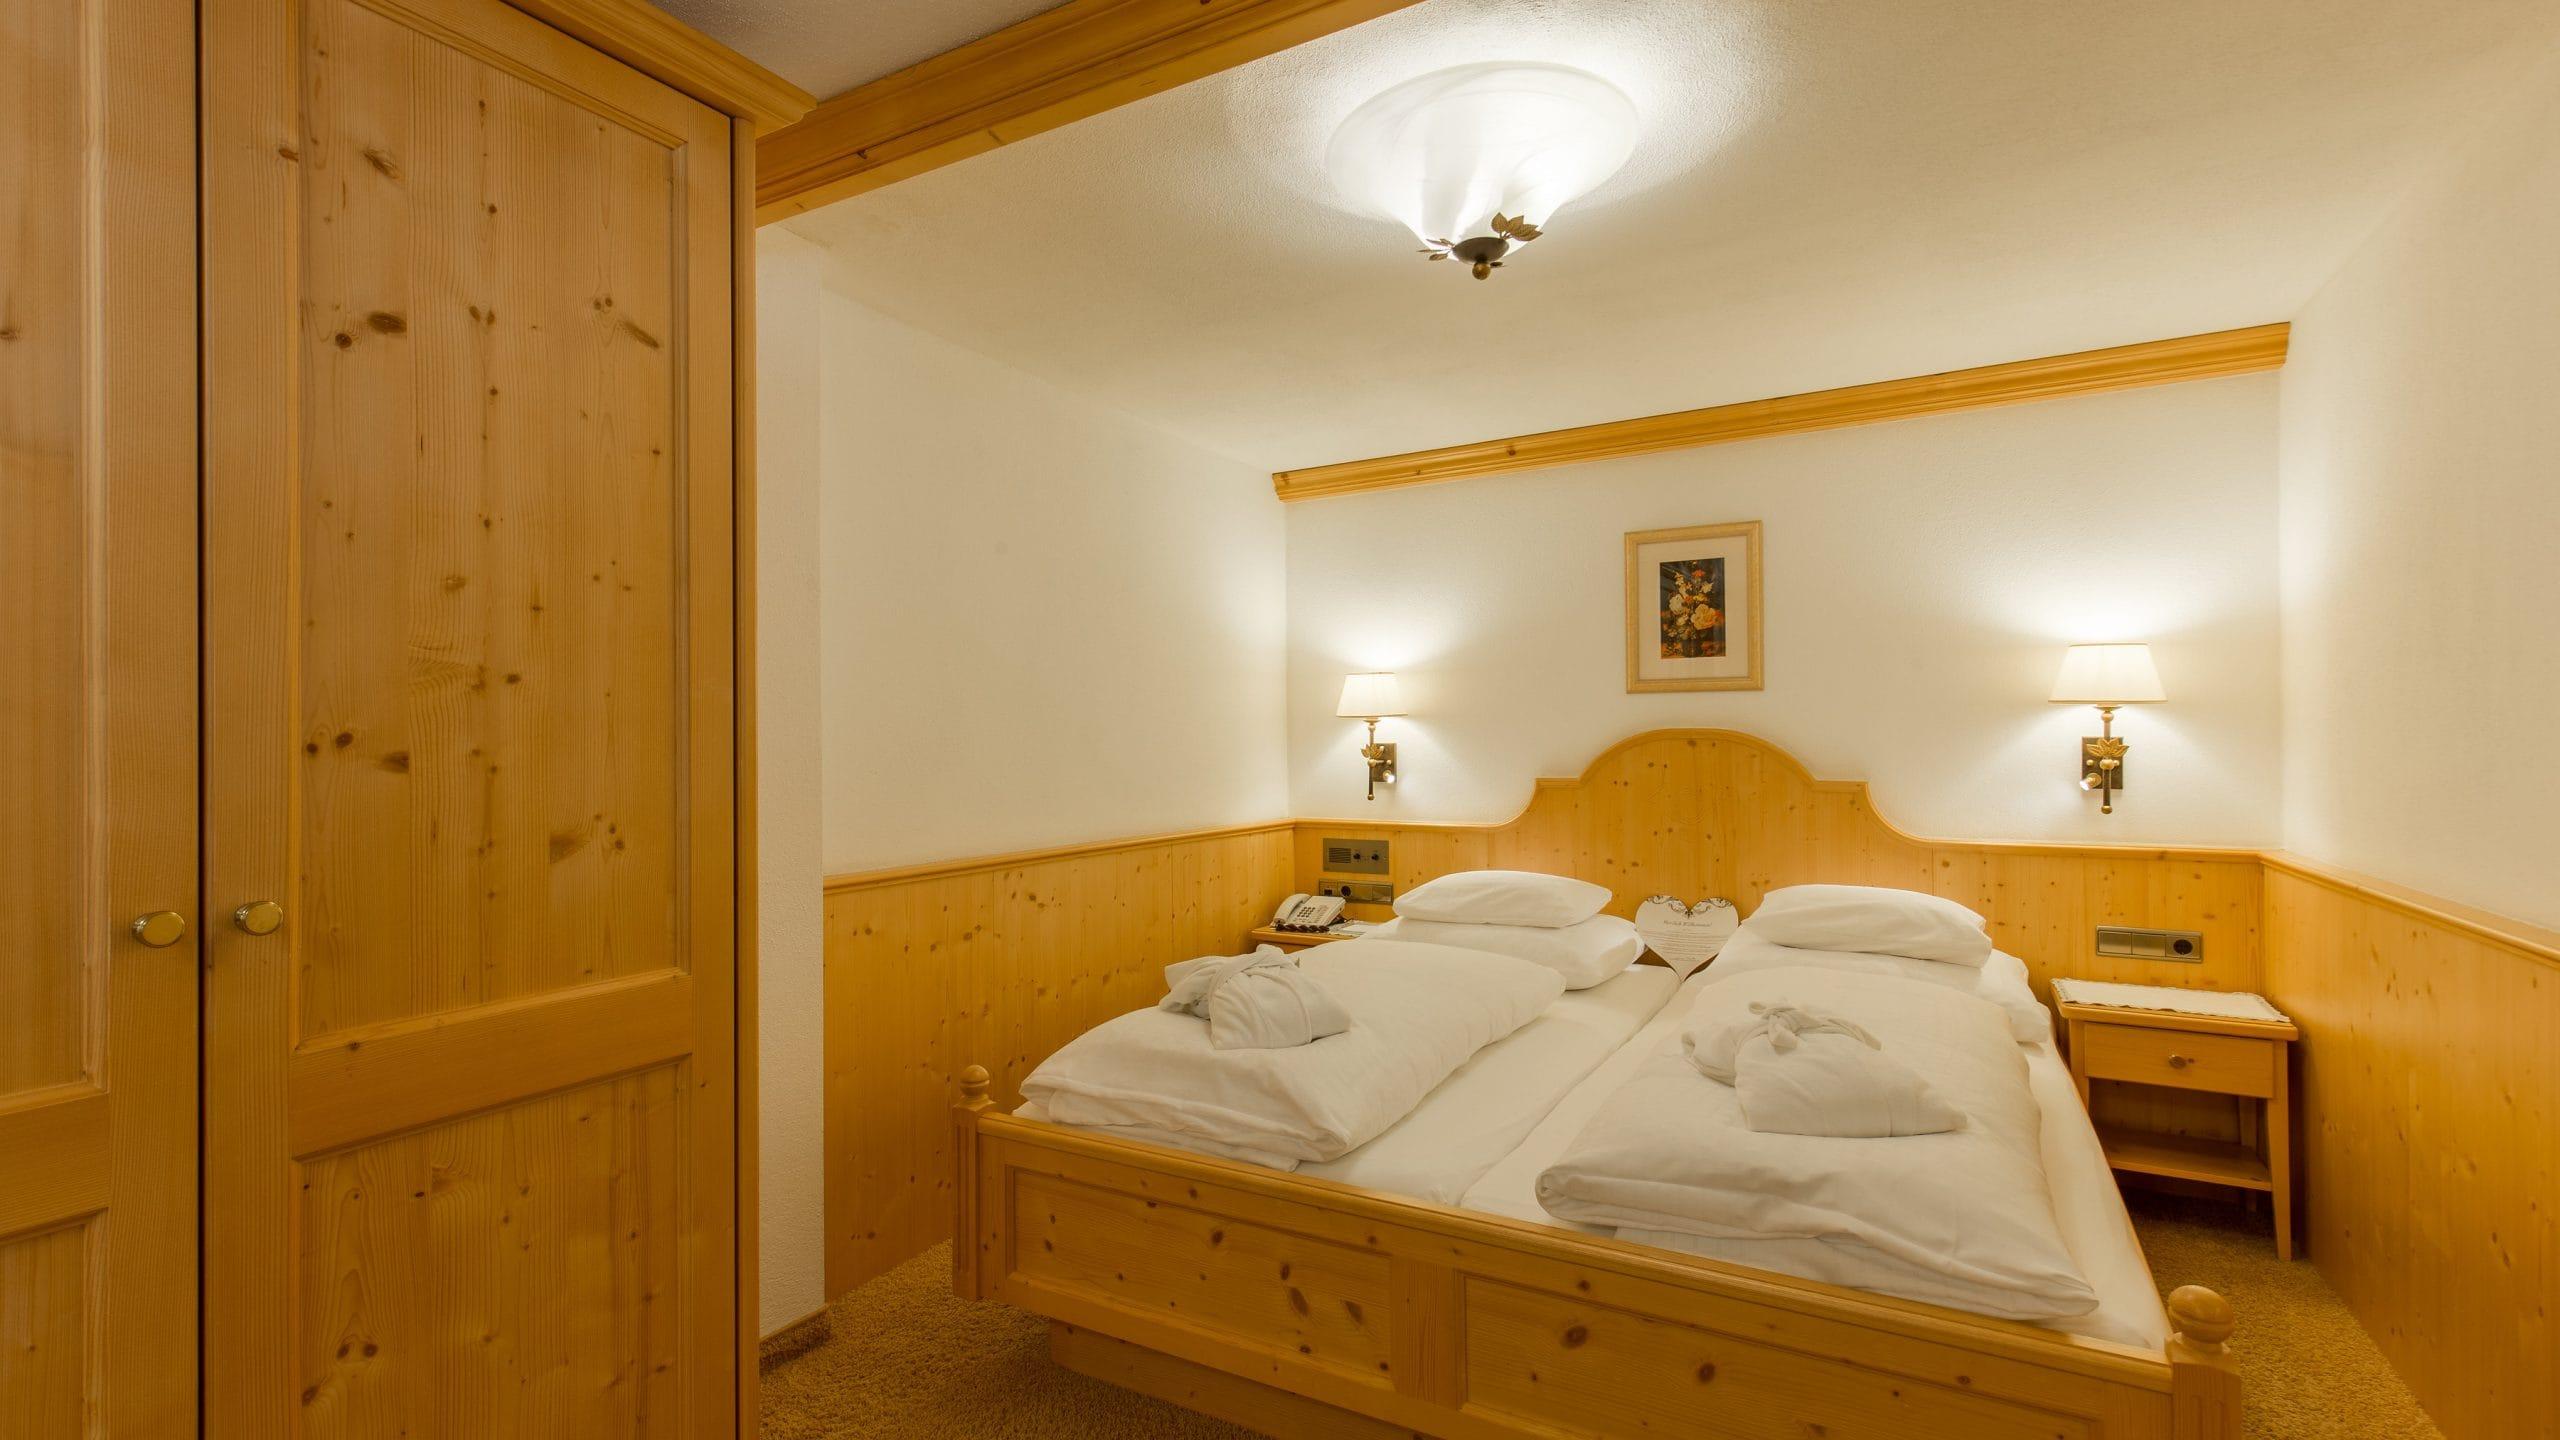 gaspingerhof highlights 2017 54 Zimmer 218 scaled